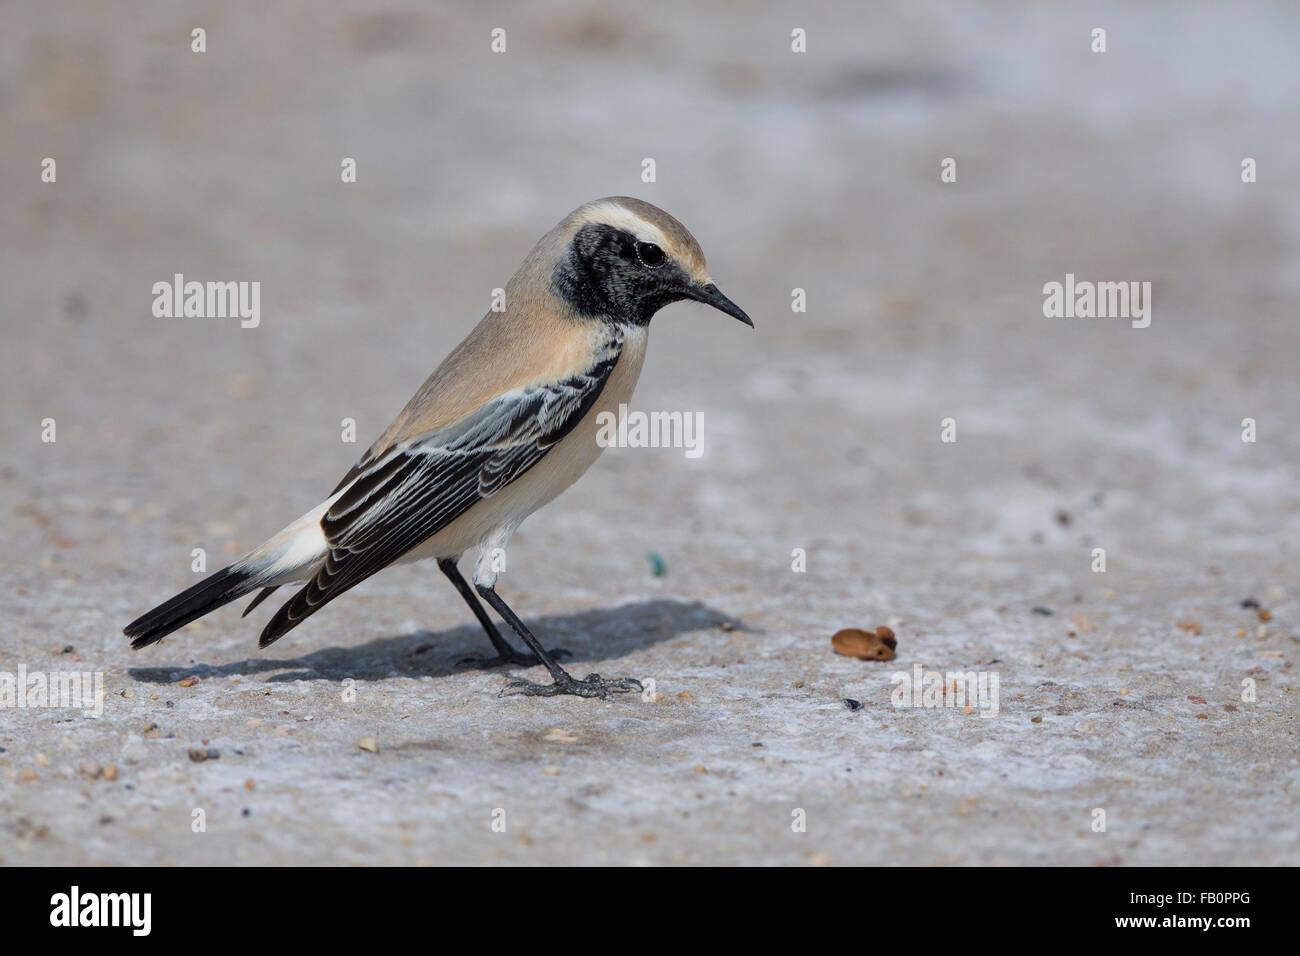 Desert Wheatear (Oenanthe deserti), Standing on the ground, Taqah, Dhofar, Oman - Stock Image